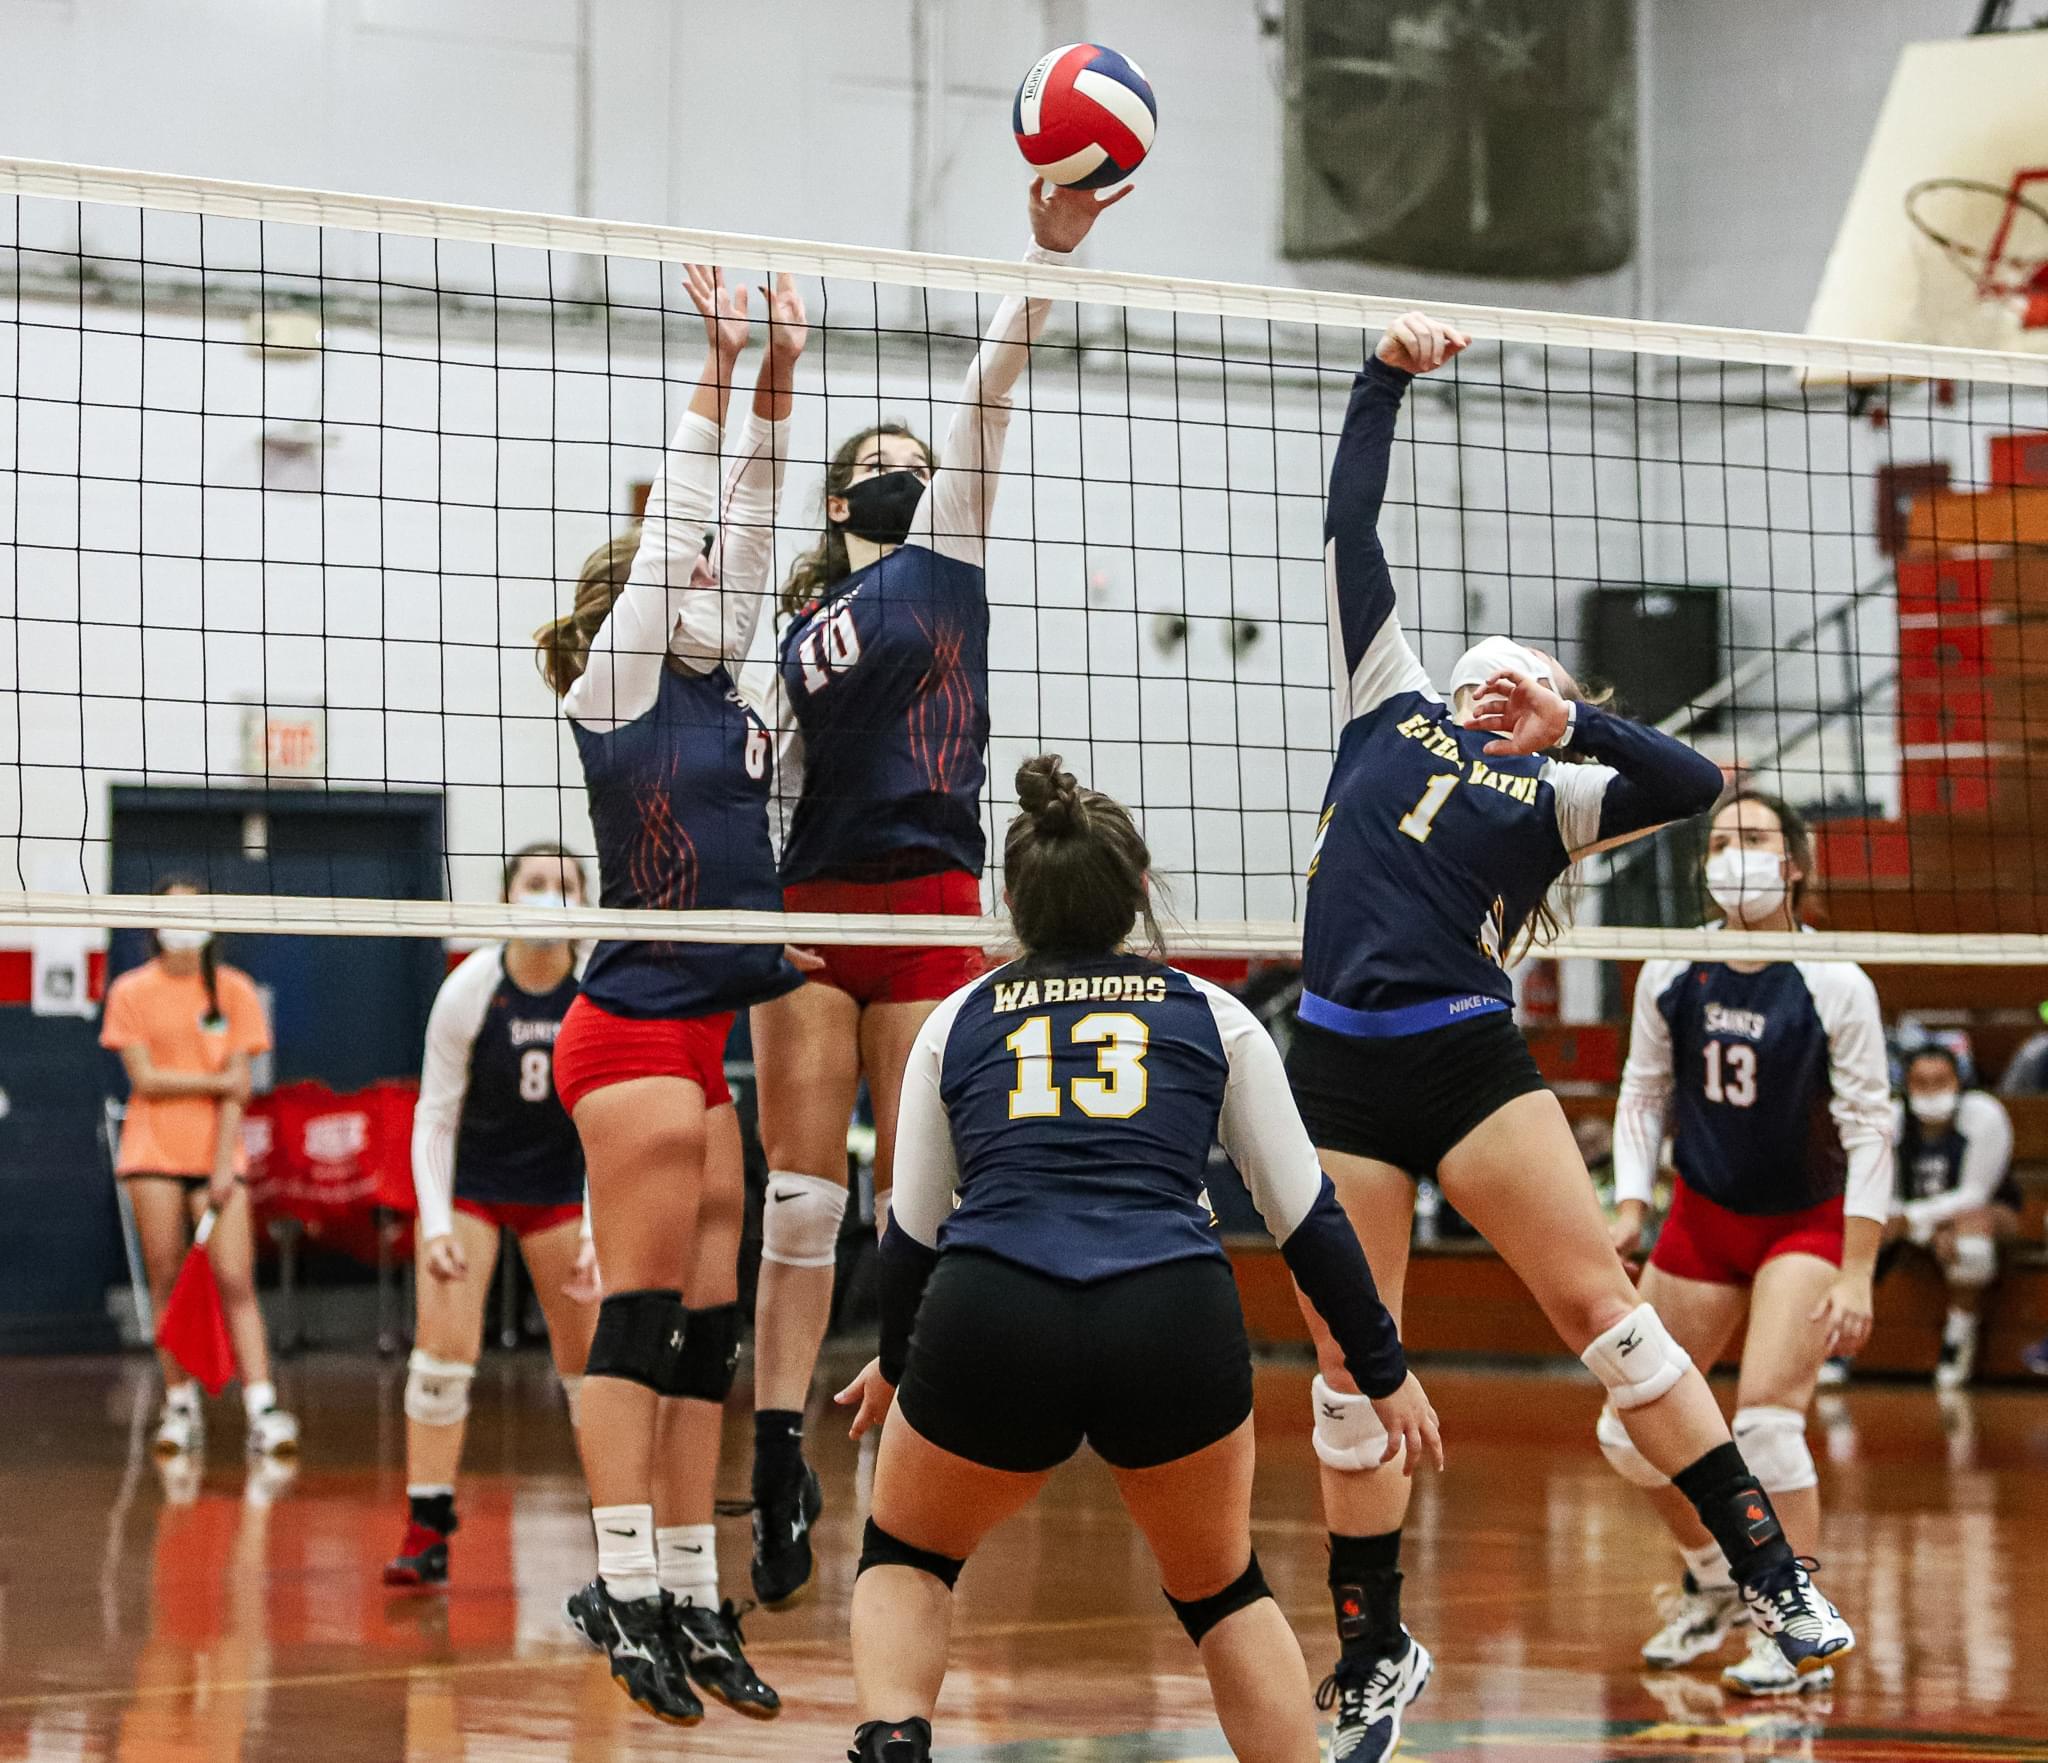 Volleyball: Southern Wayne Topples Eastern Wayne (PHOTO GALLERY)